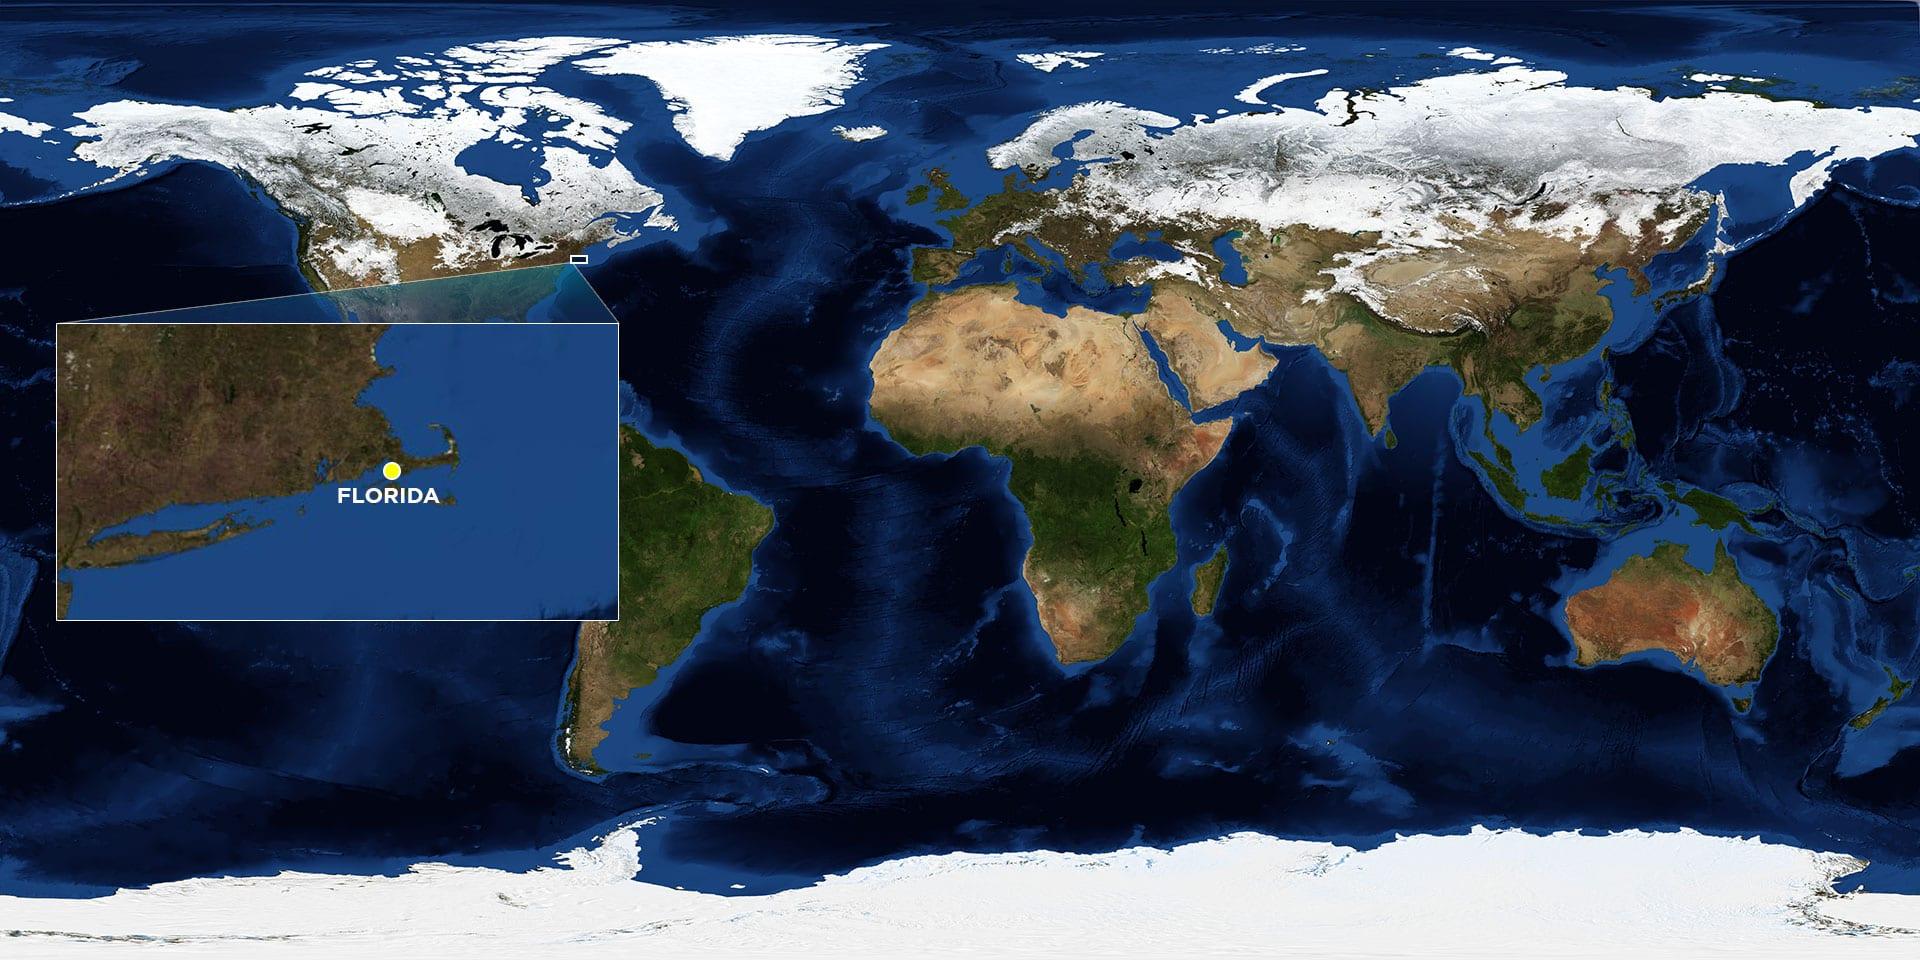 earth-oilspills-florida